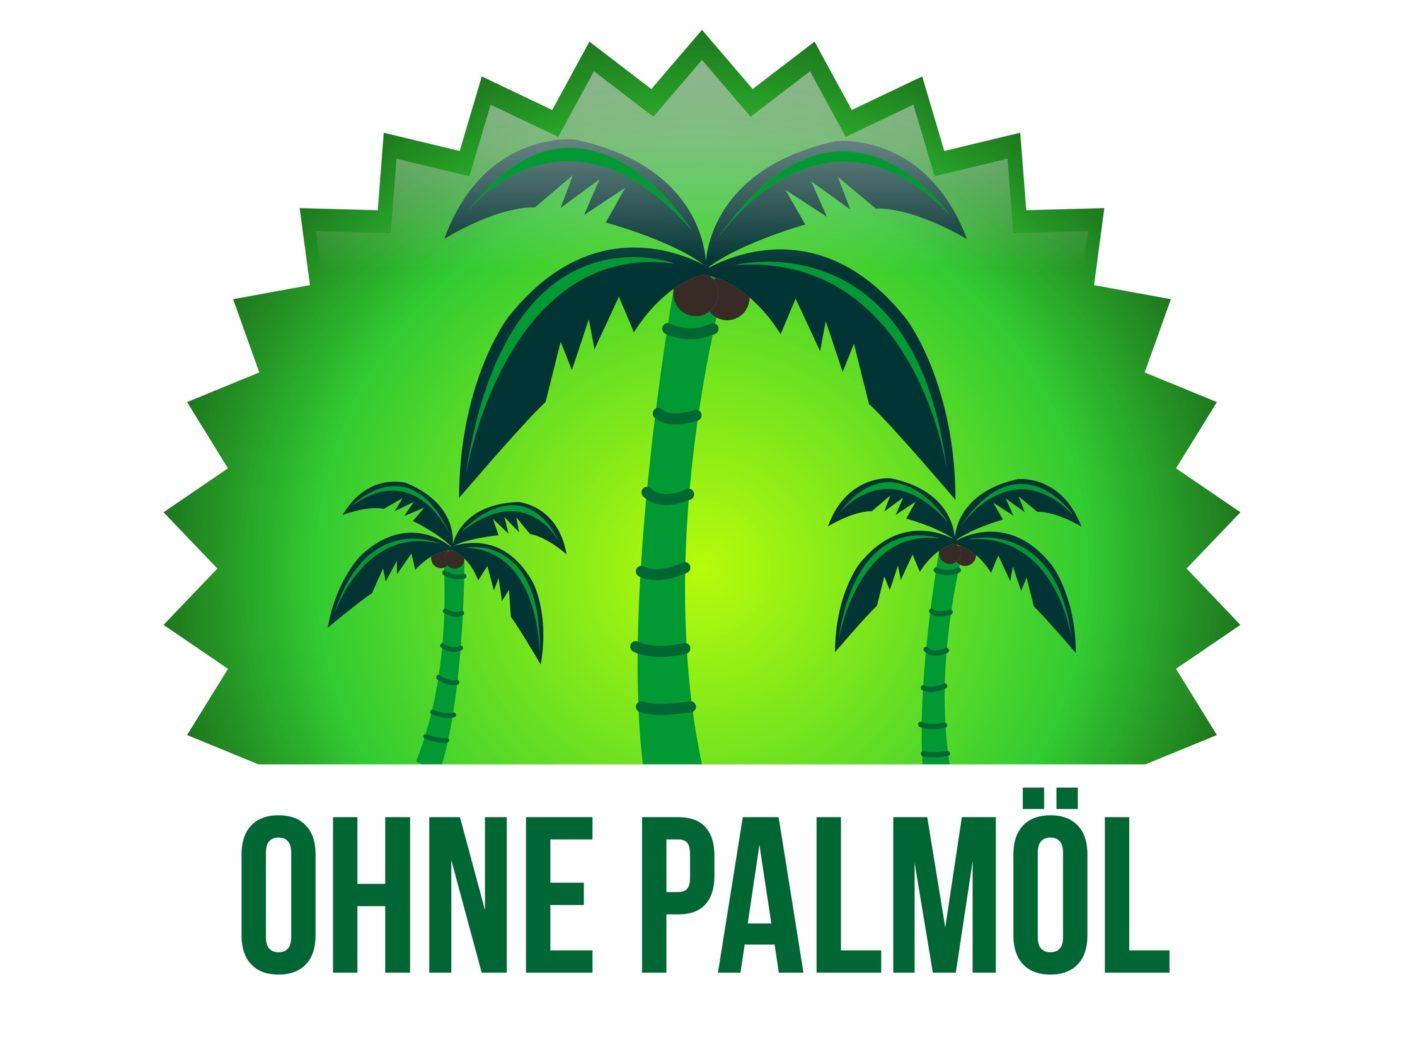 palmölfrei, Elaeis guineensis, CSPO